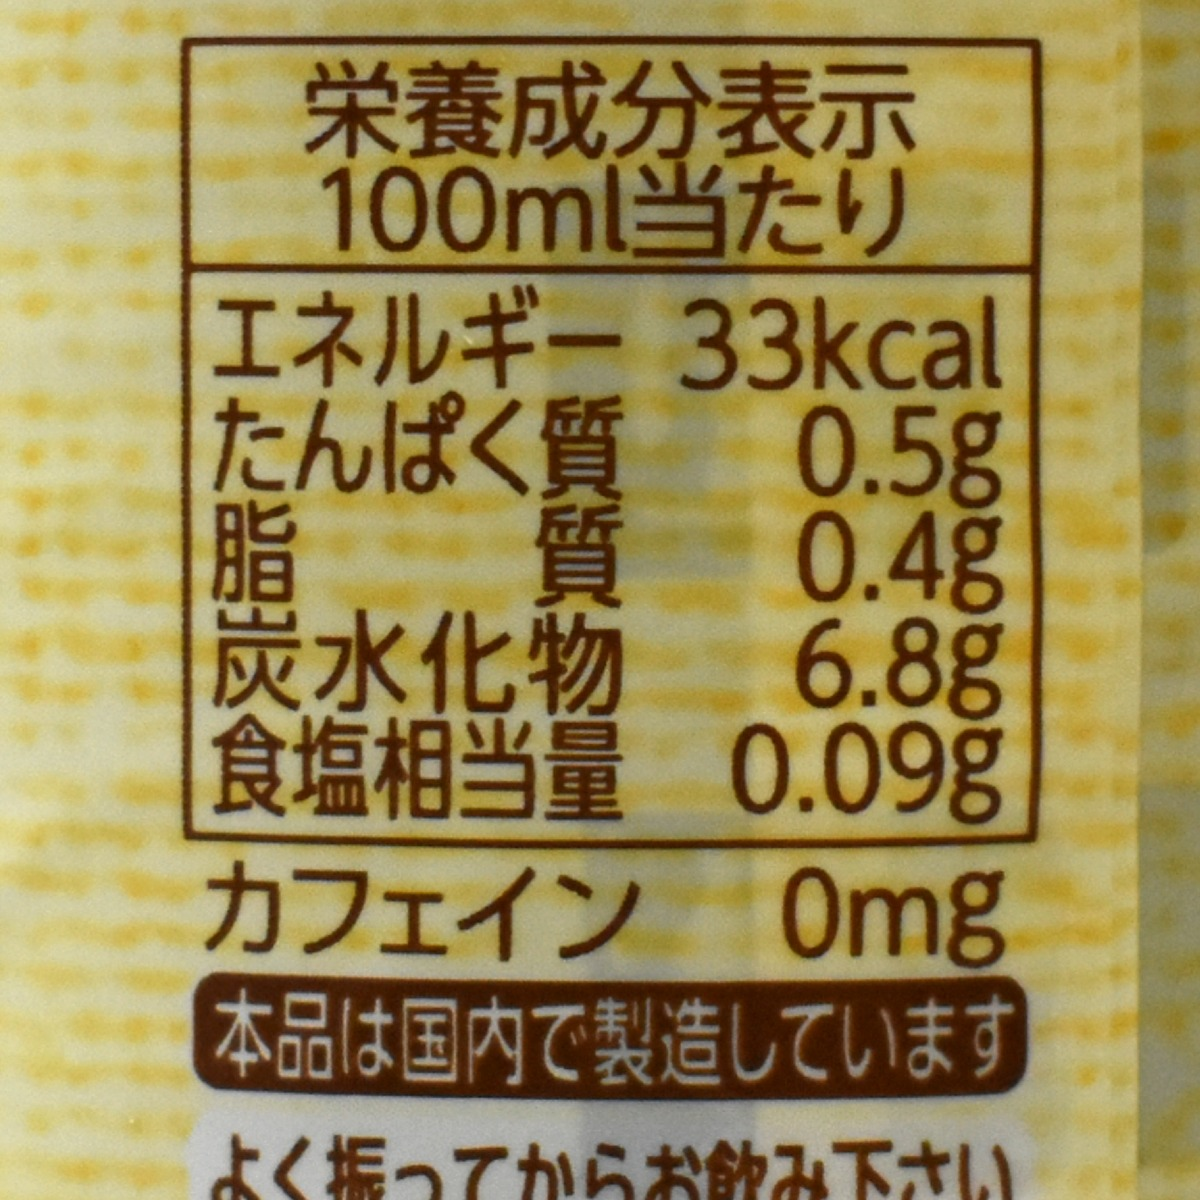 TEAs' TEA NEW AUTHENTIC 麦芽オレの栄養成分表示